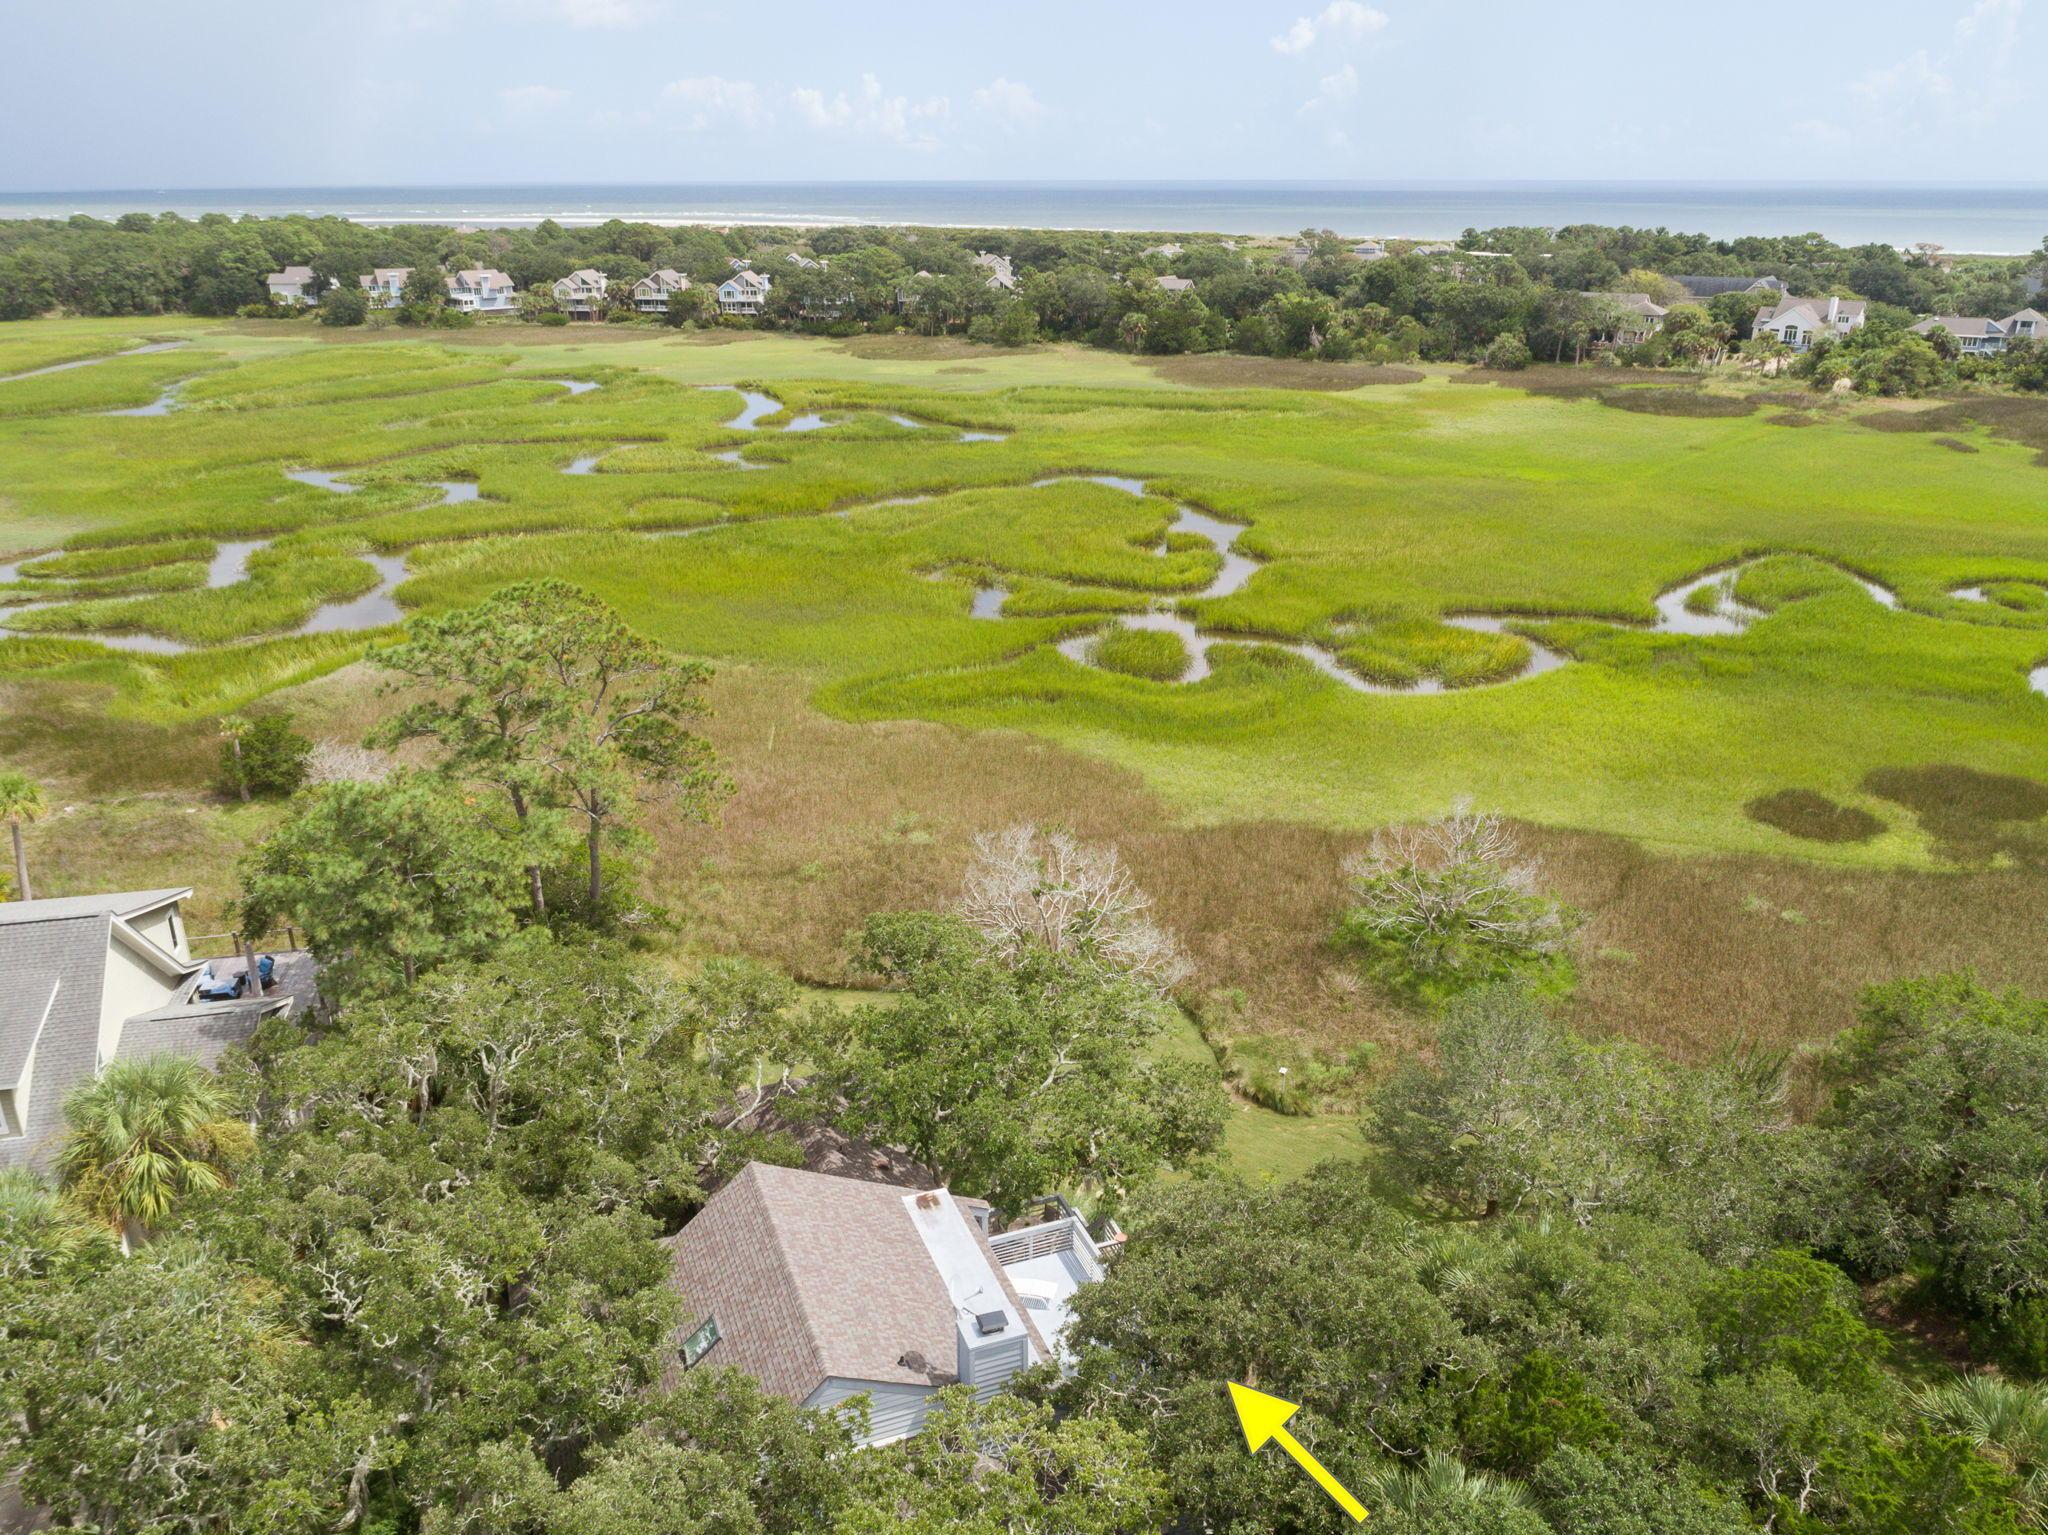 Seabrook Island Homes For Sale - 3360 Seabrook Island, Seabrook Island, SC - 21